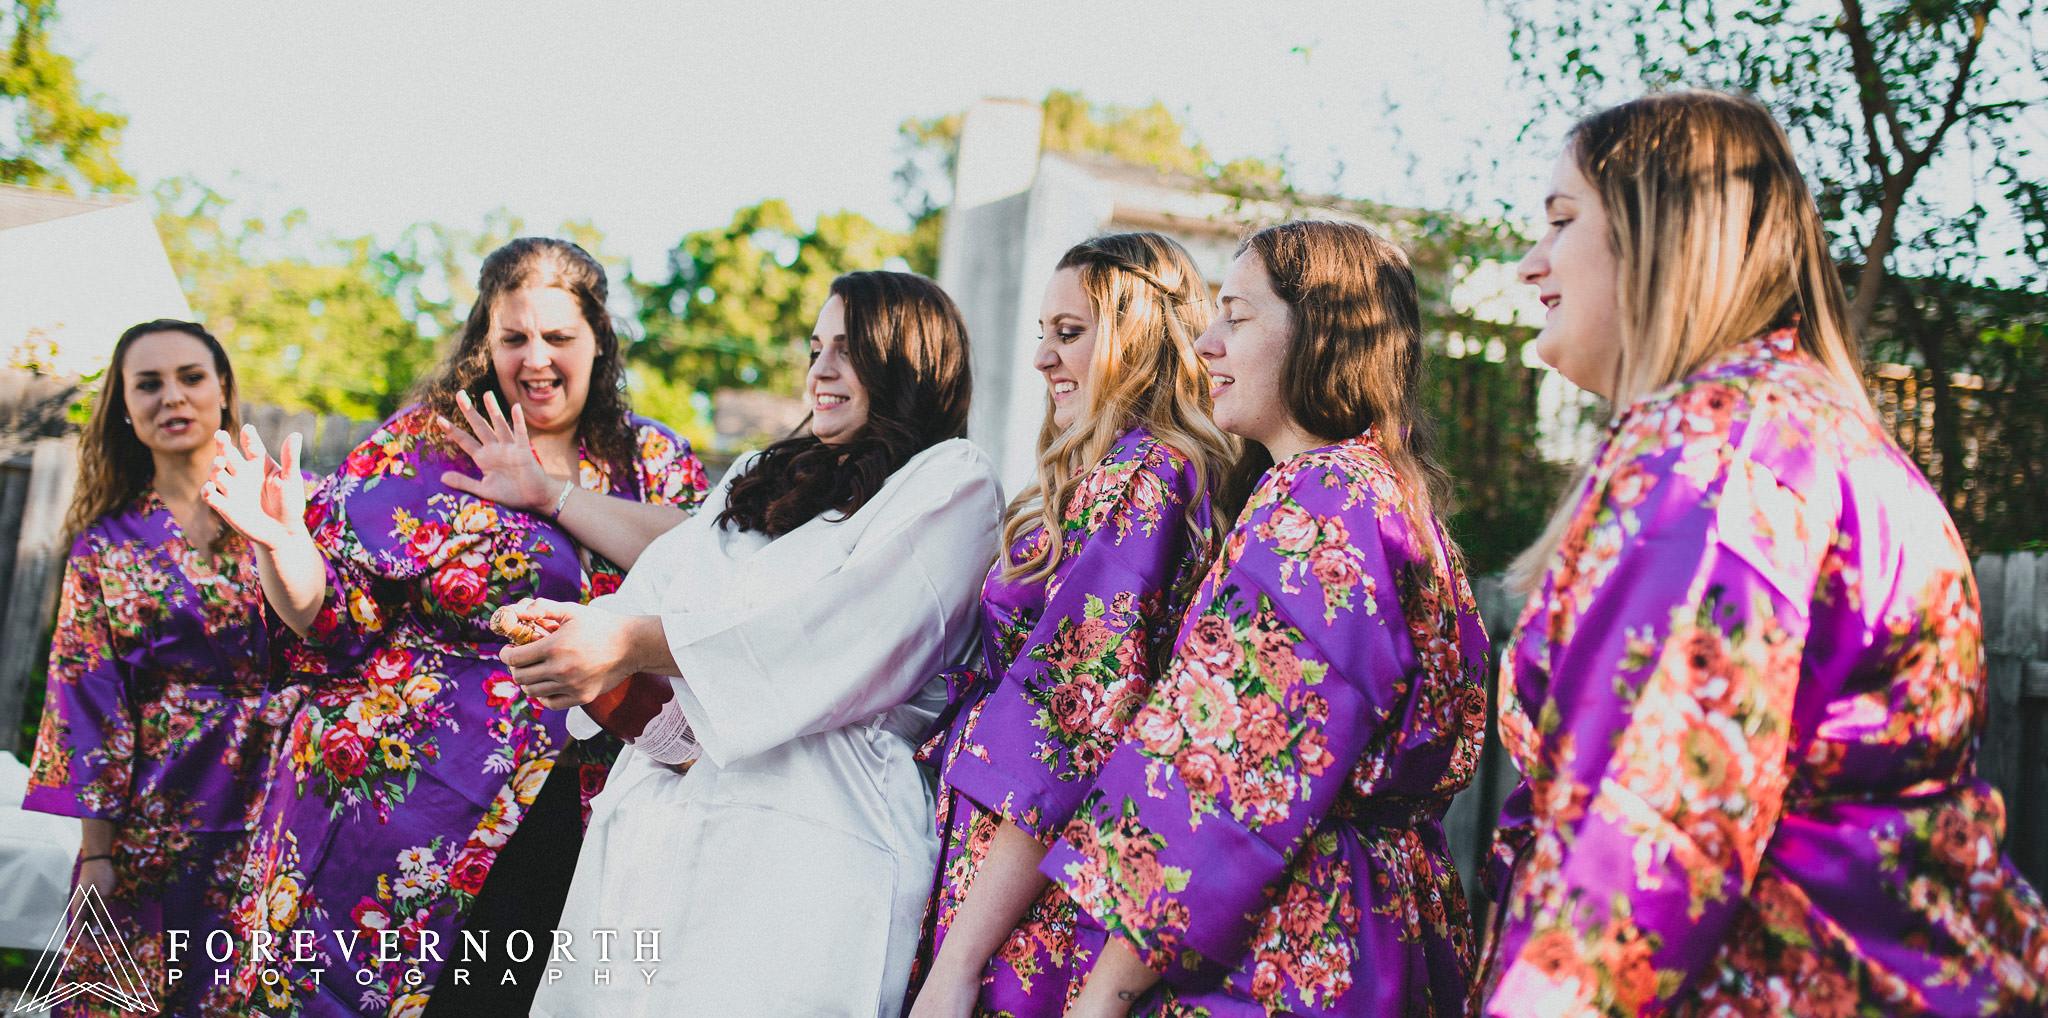 Brown-Allaire-State-Park-Wedding-Photographer-08.JPG